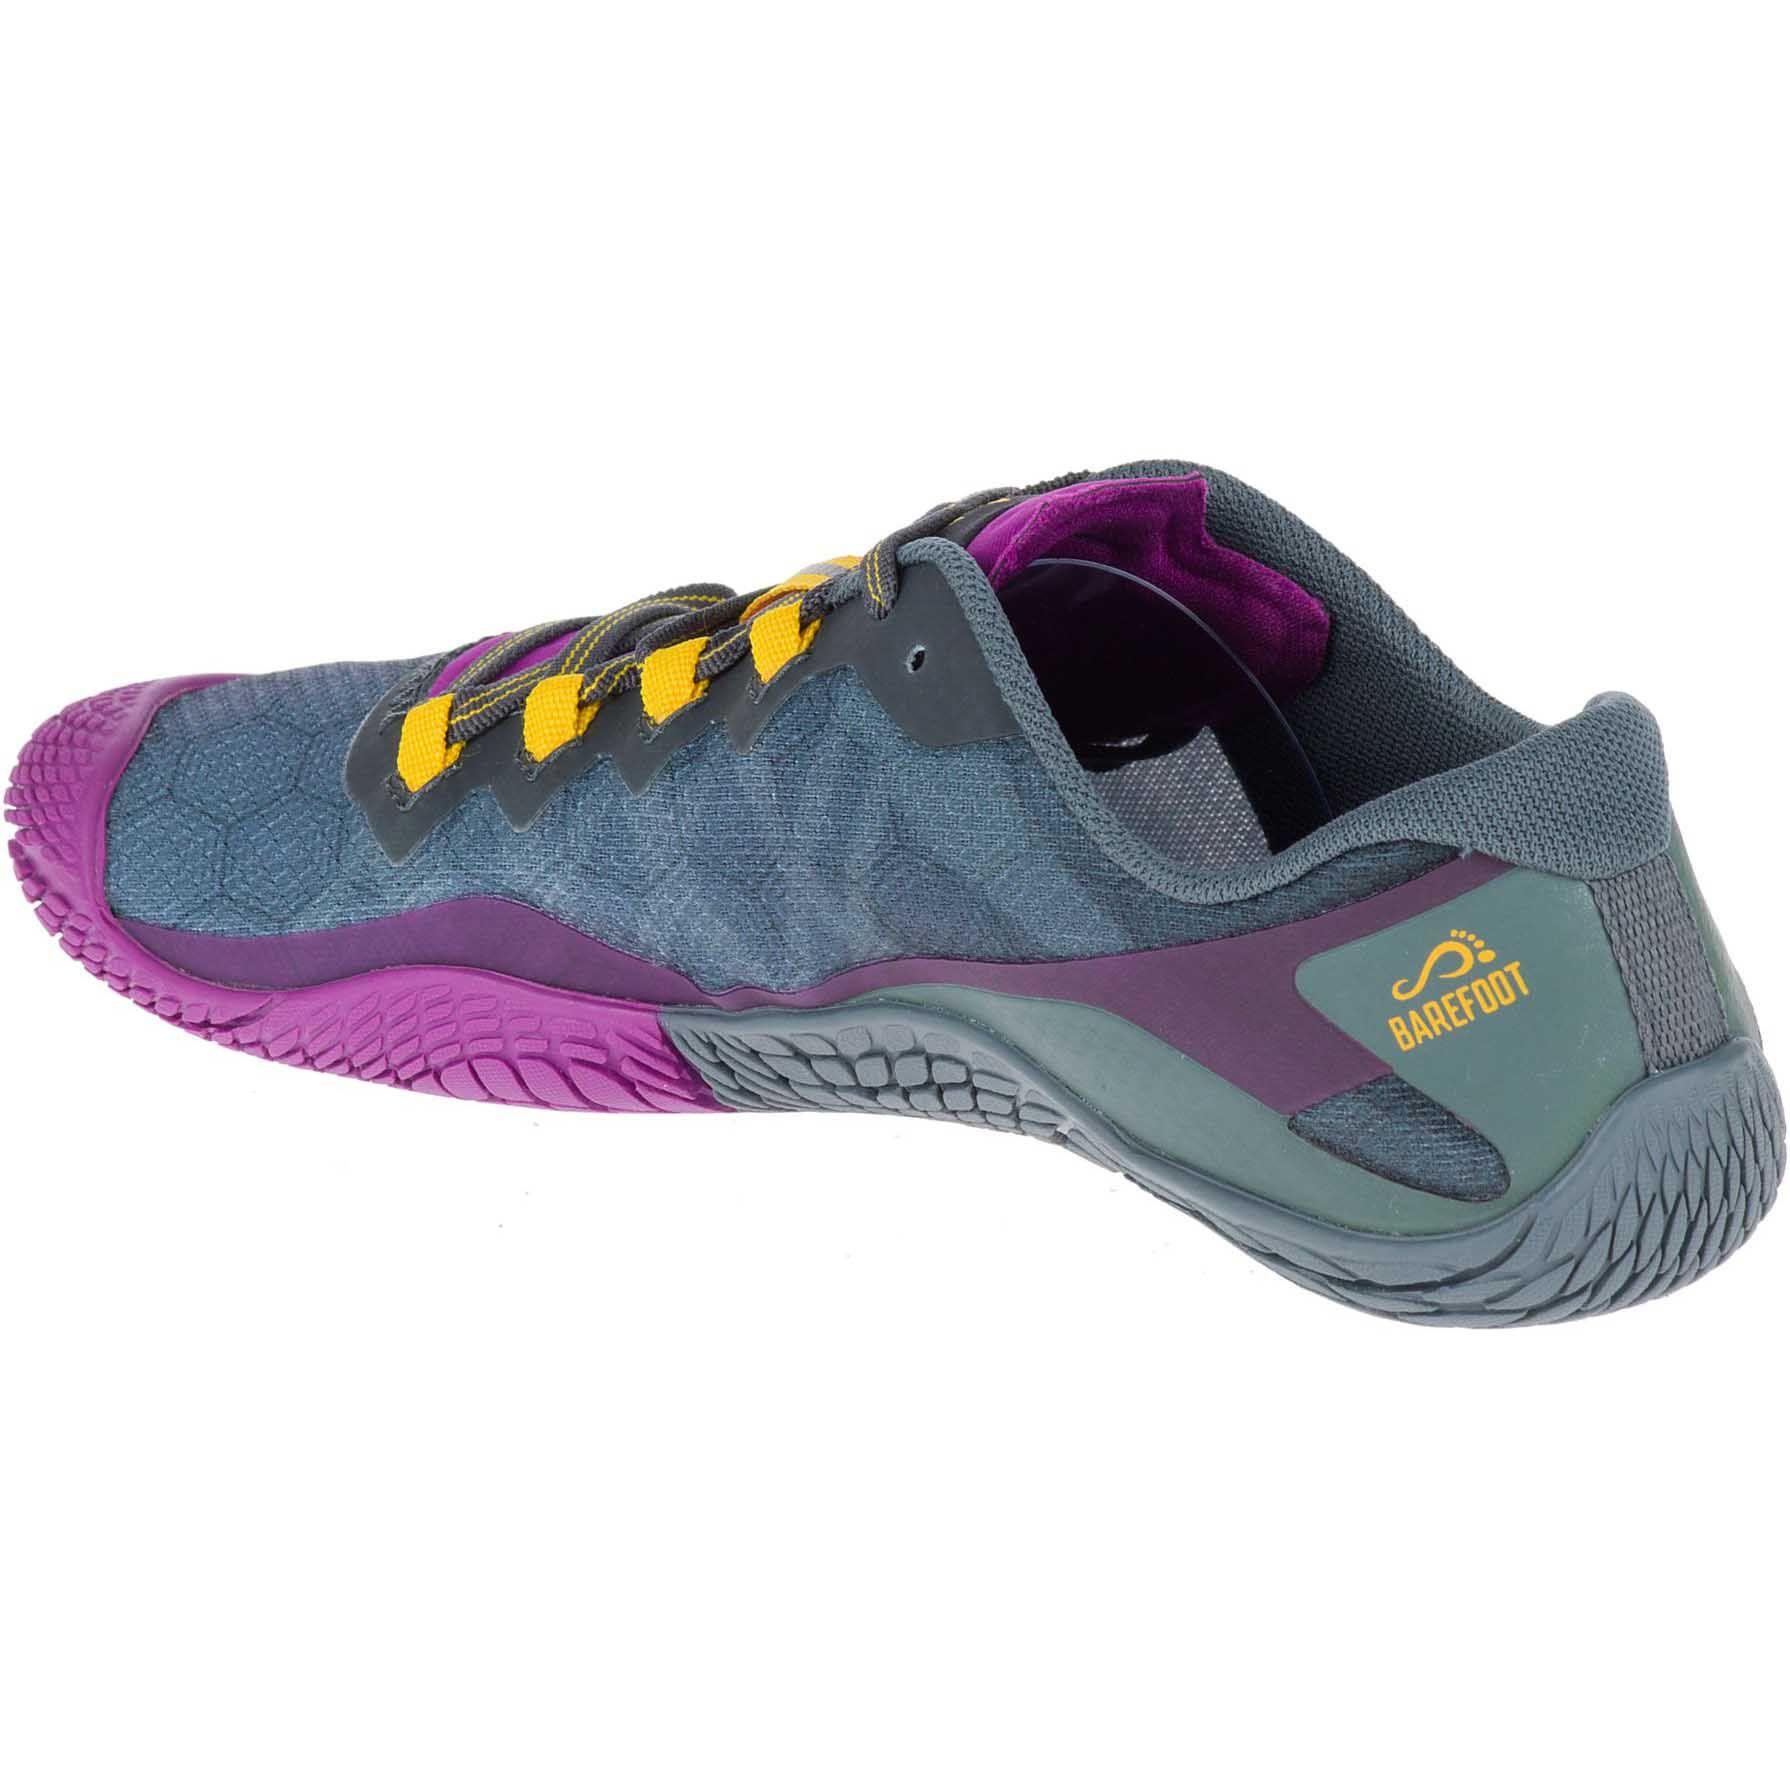 Merrell Ladies Tennis Shoes